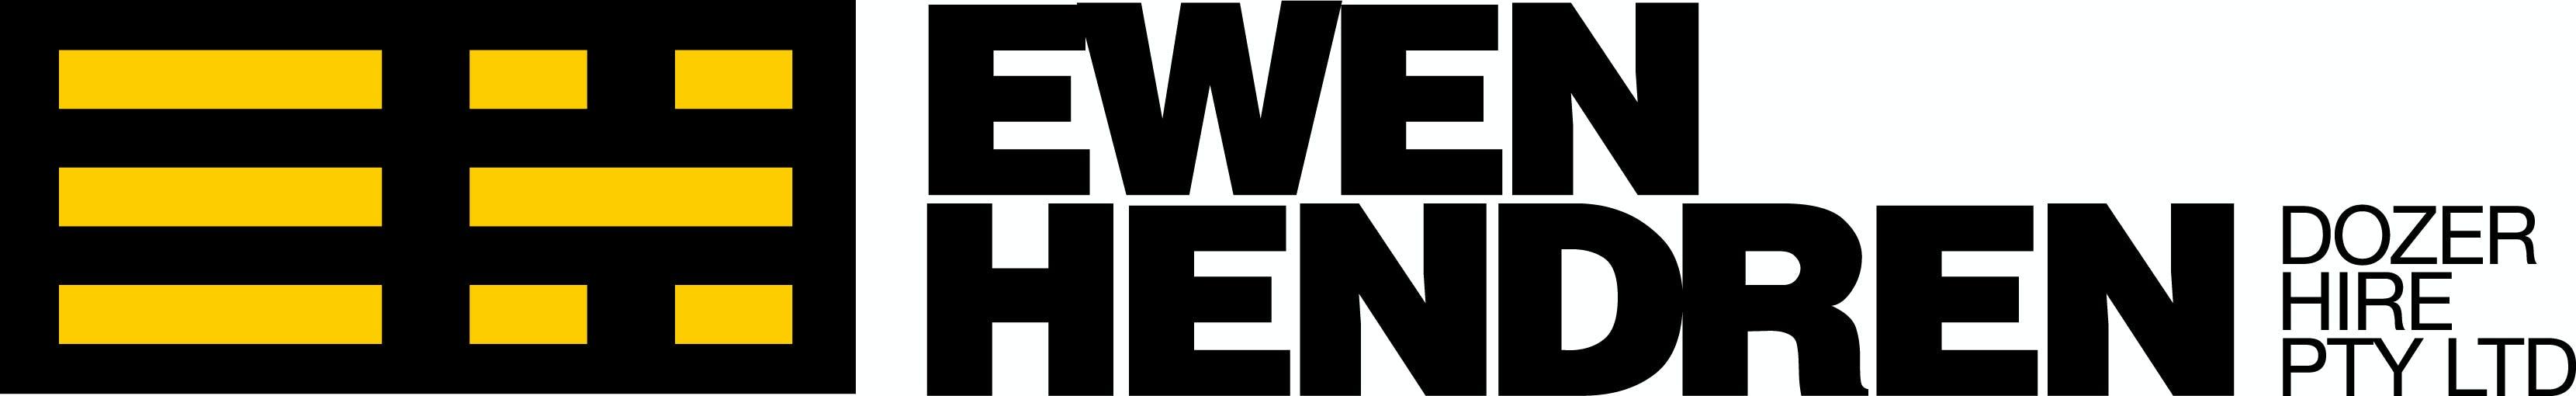 Ewen Hendren Dozer HIre Pty Ltd